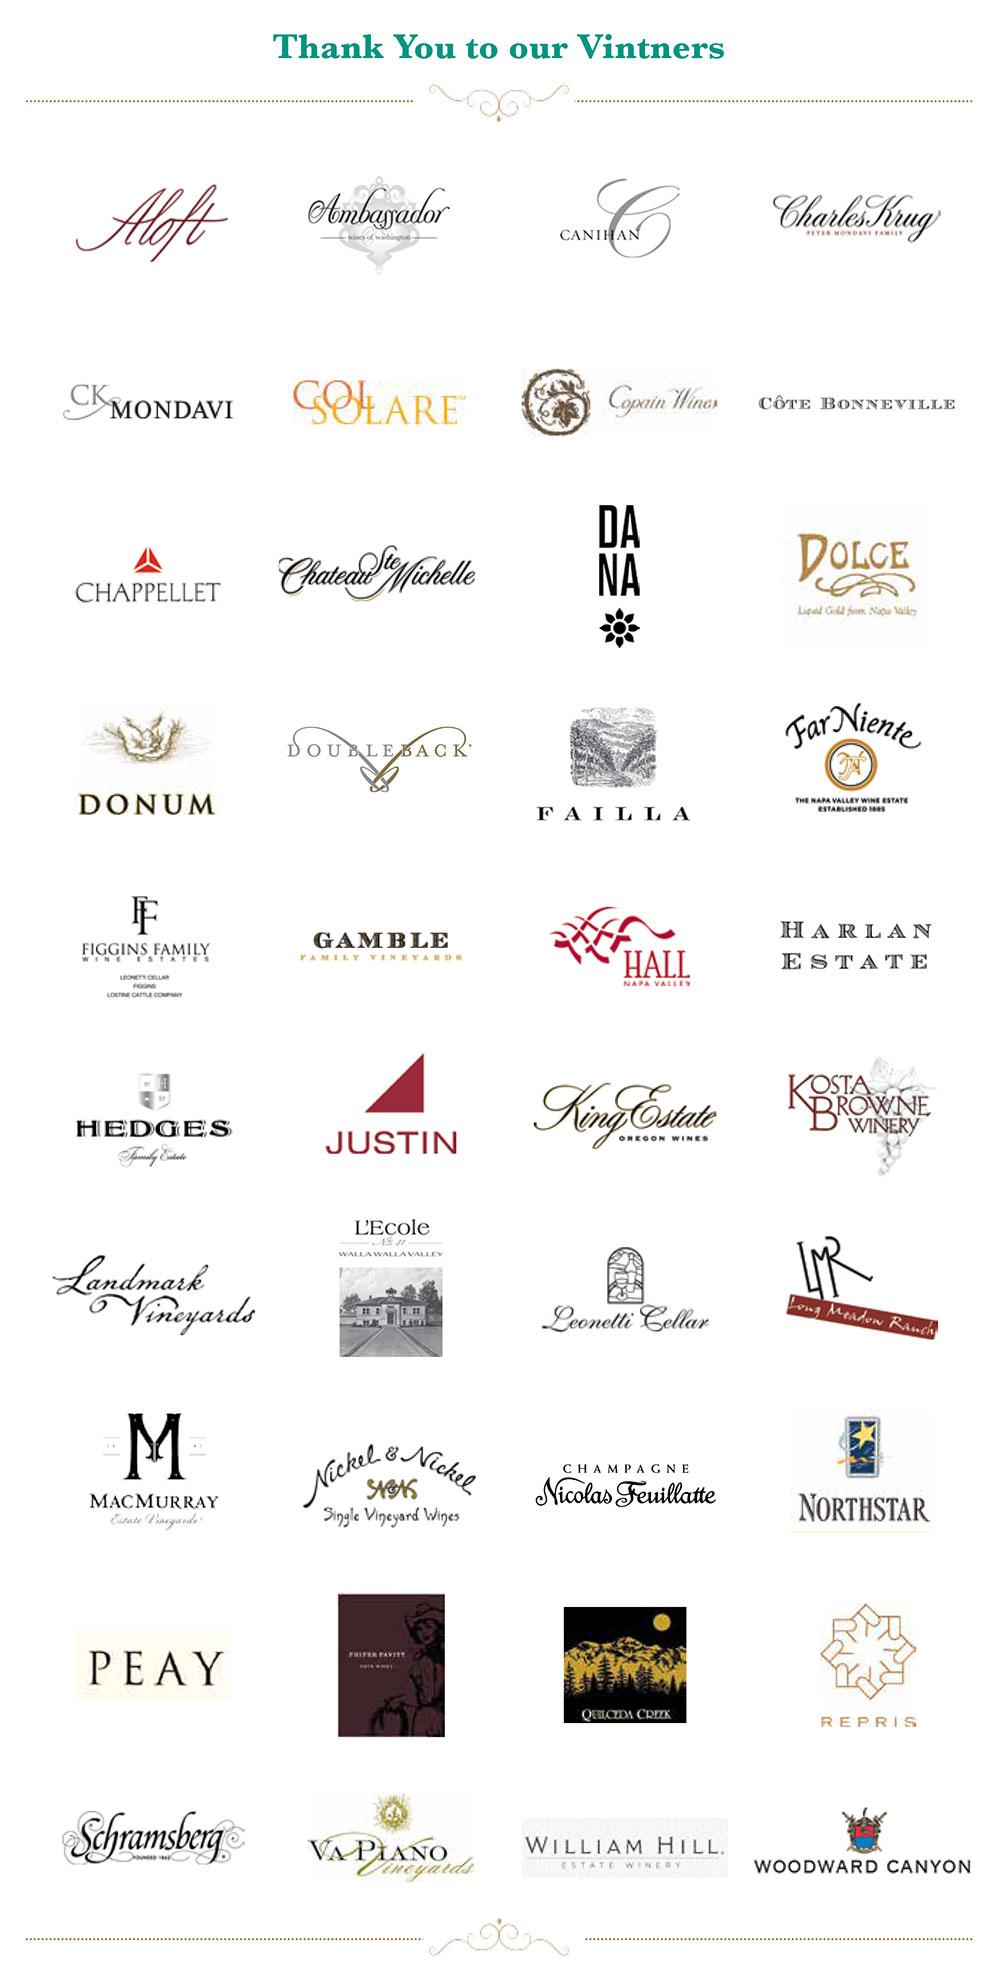 Vintners_logos_all_web_